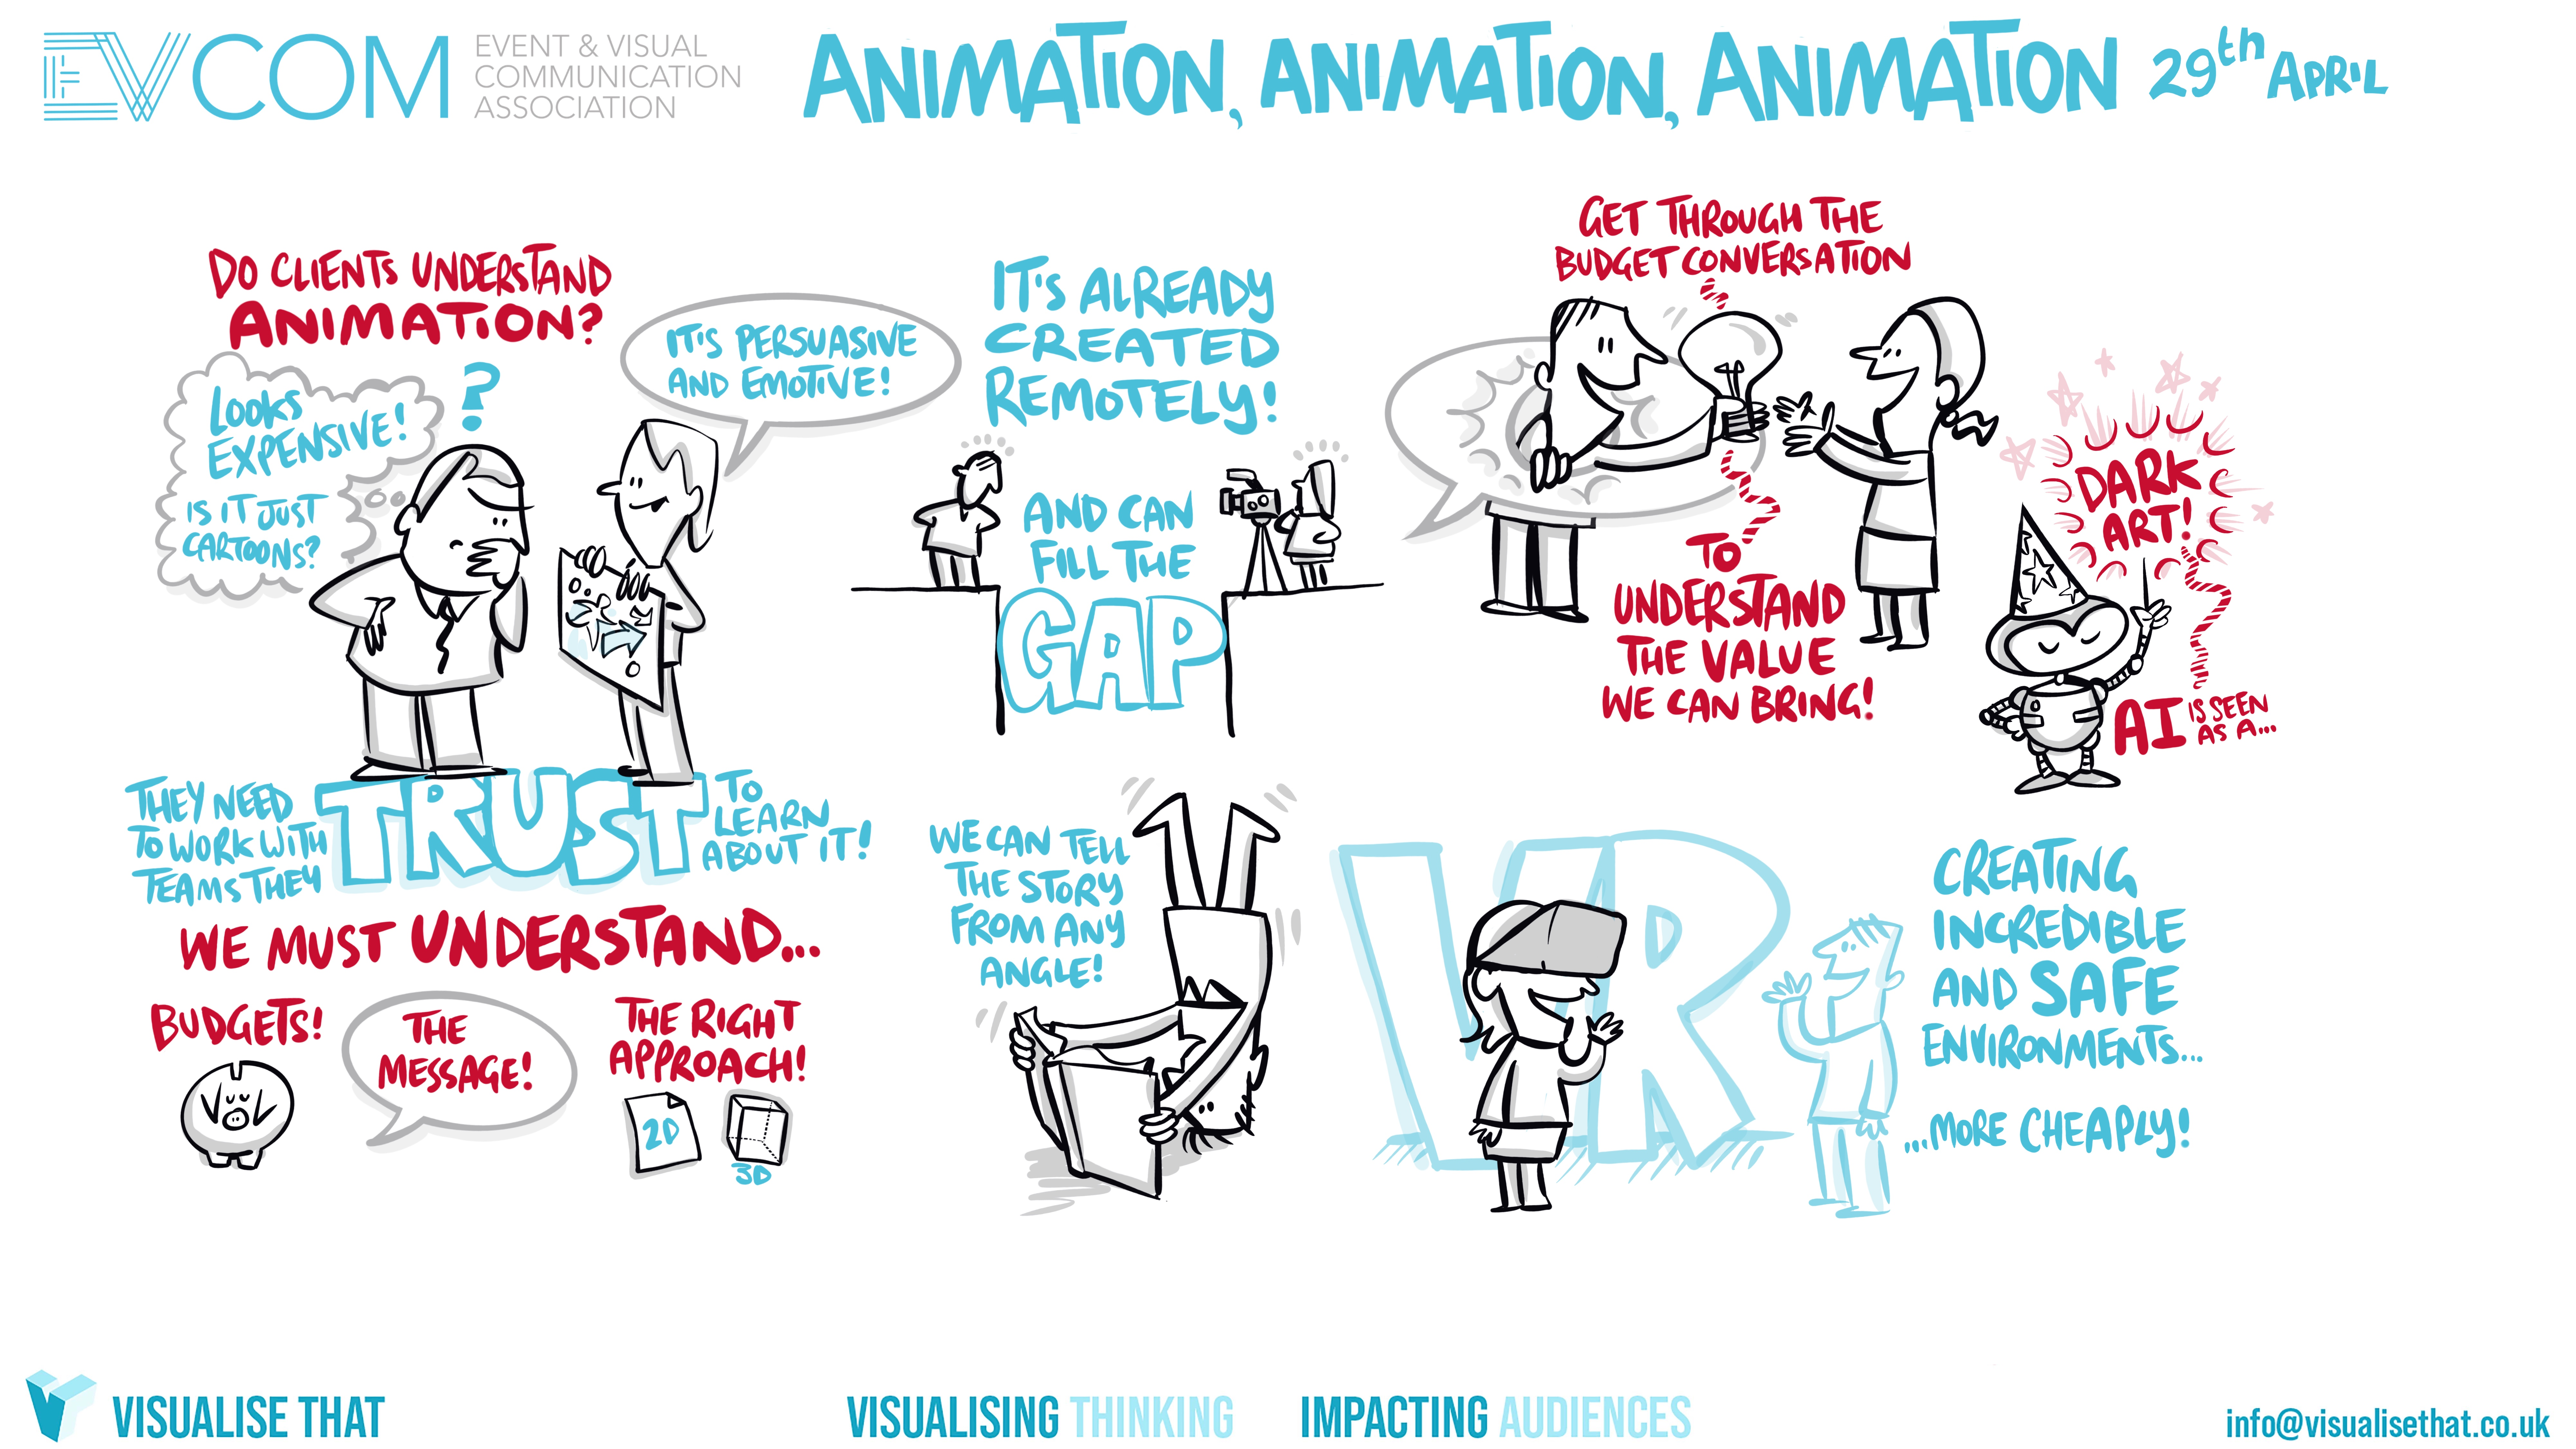 EVCOM Sessions: Animation, Animation, Animation